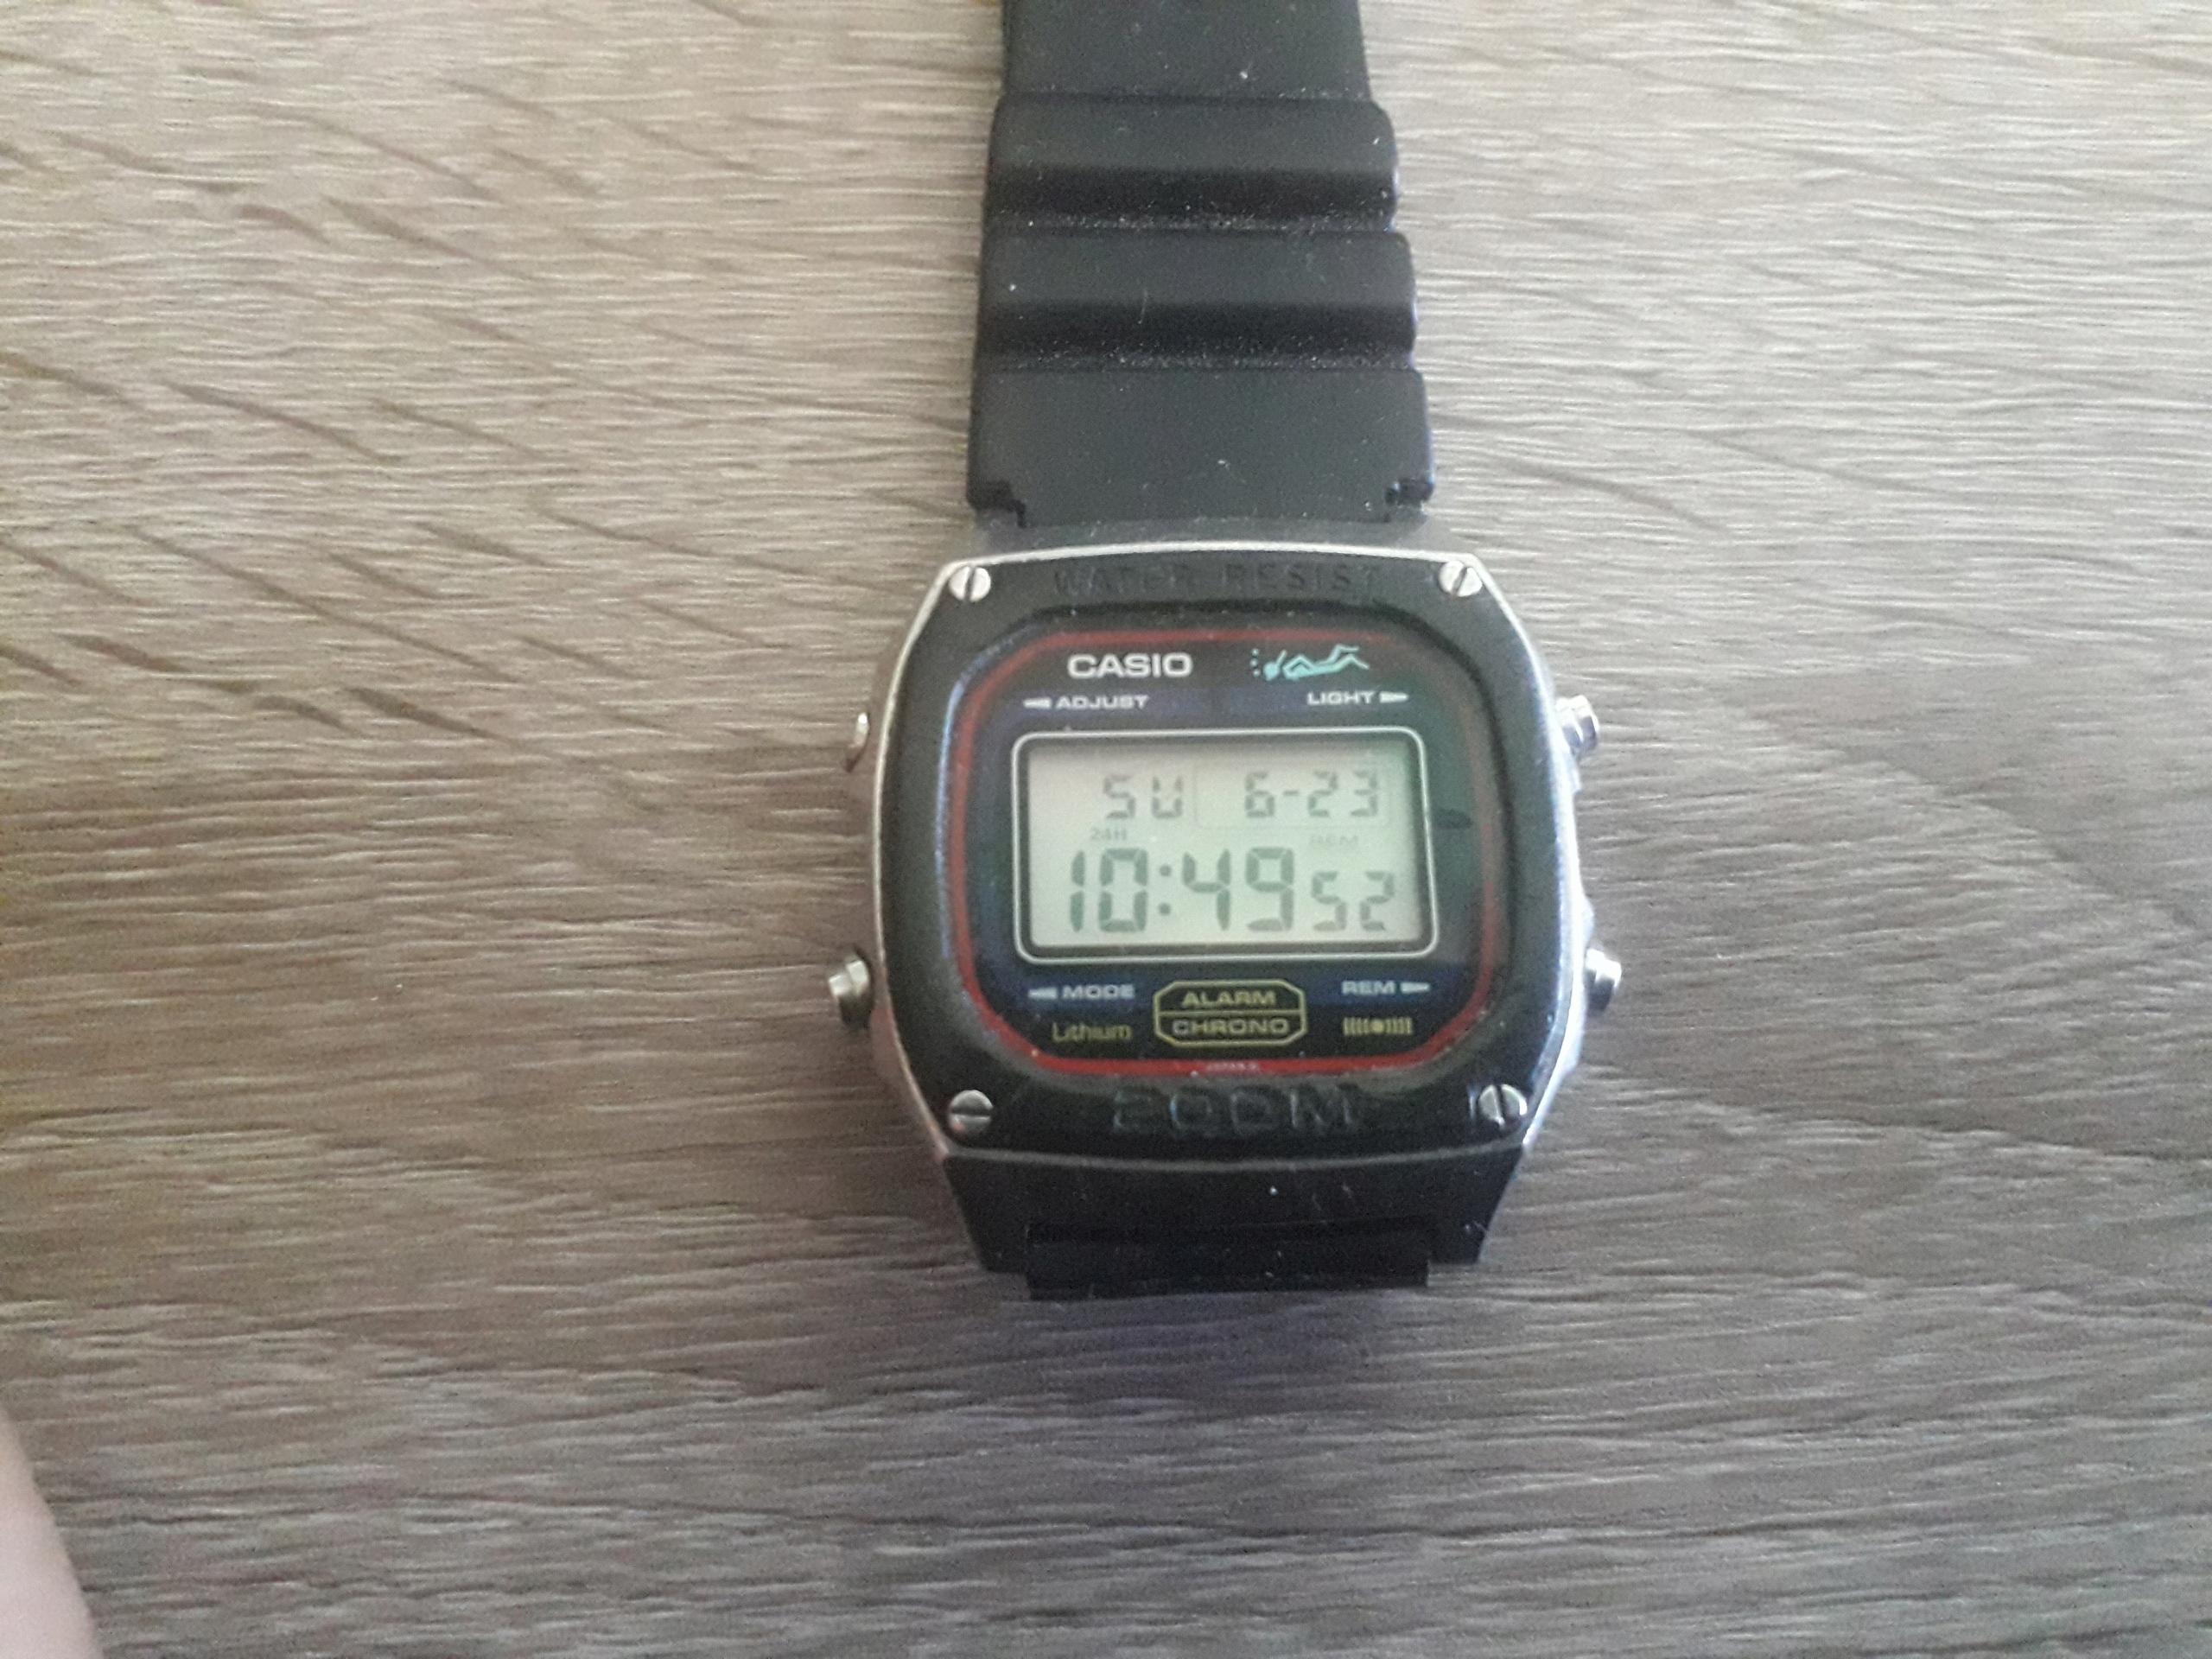 Casio DW-1500